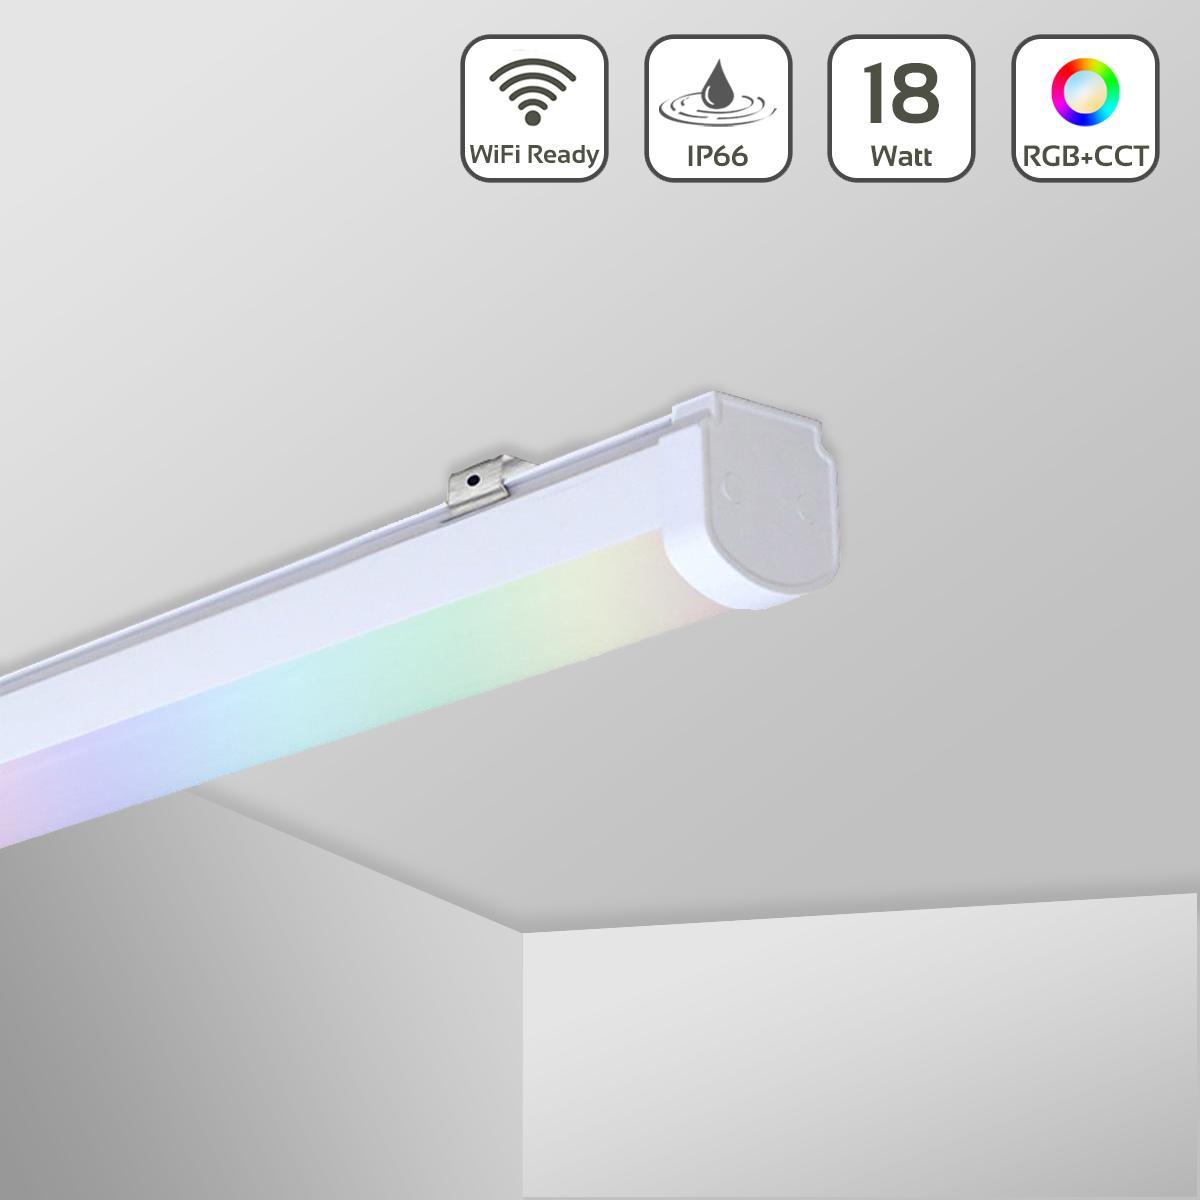 MiBoxer 18W RGB+CCT LED Linear Light WiFi Feuchtraumleuchte 230V IP66 LL-1018